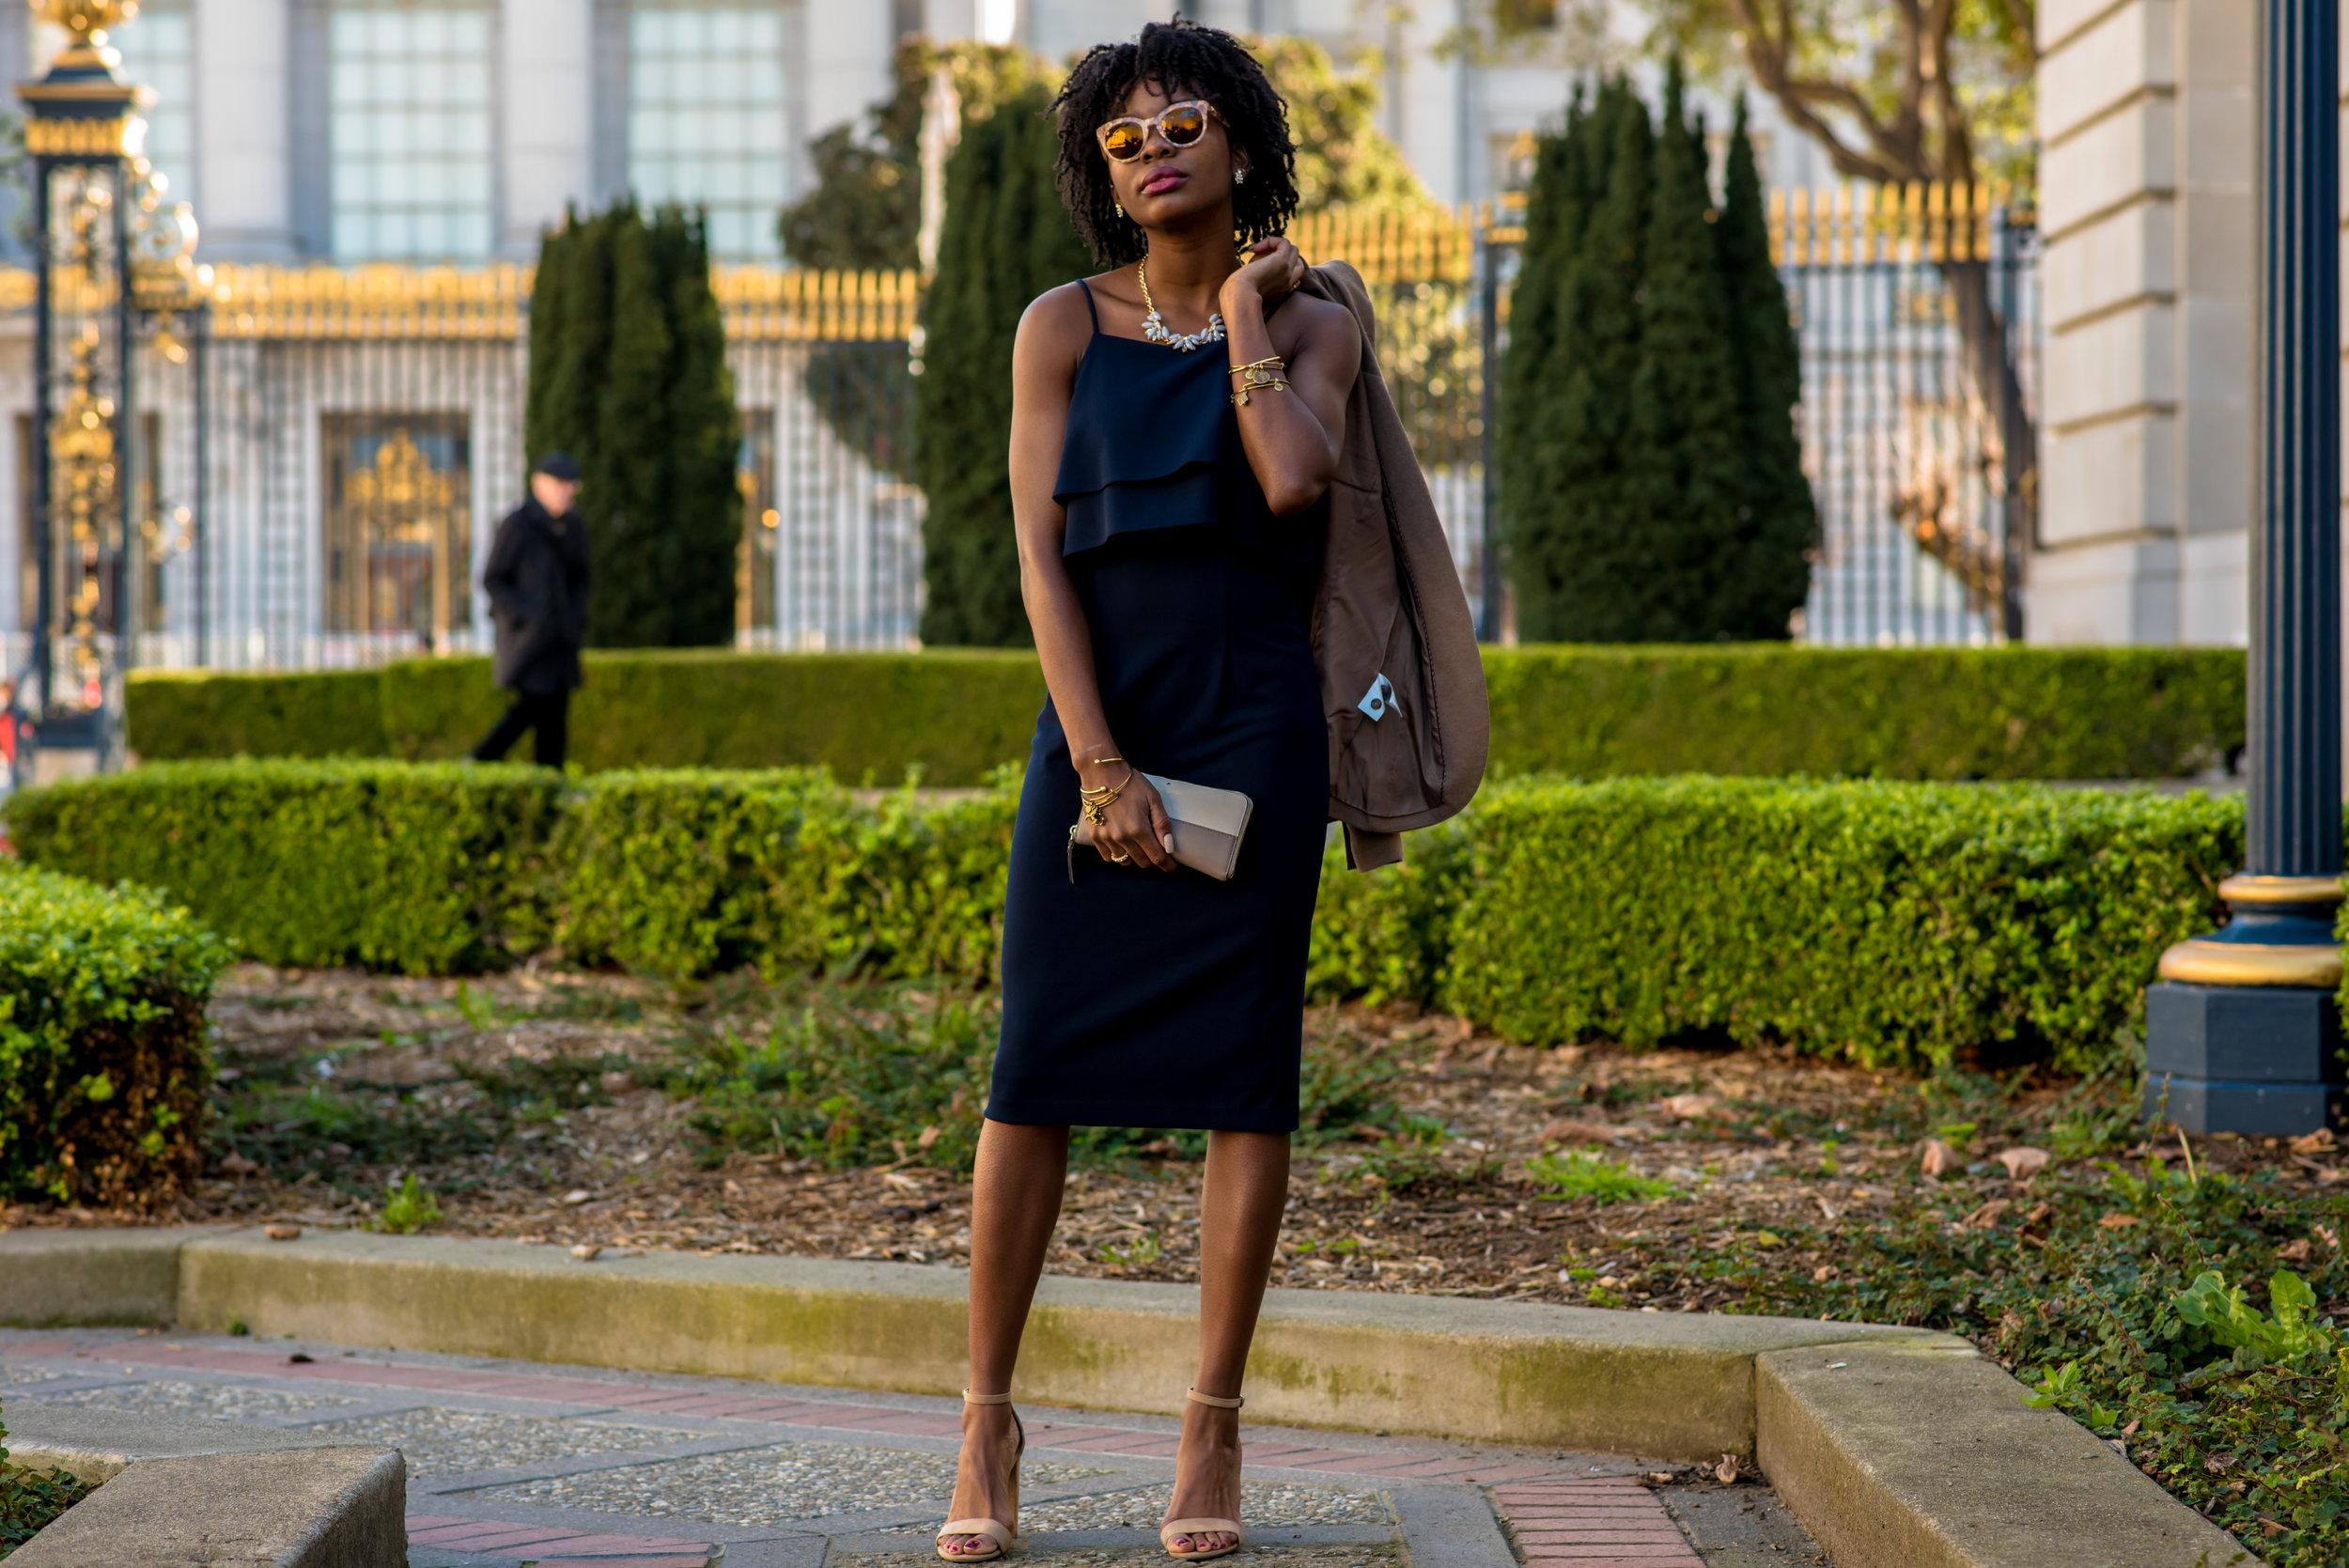 Dress: Le Tote; Blazer: H&M; Shoes: Report; Necklace: Le Tote; Clutch: Kate Spade; Sunglasses: Dolce & Gabbana